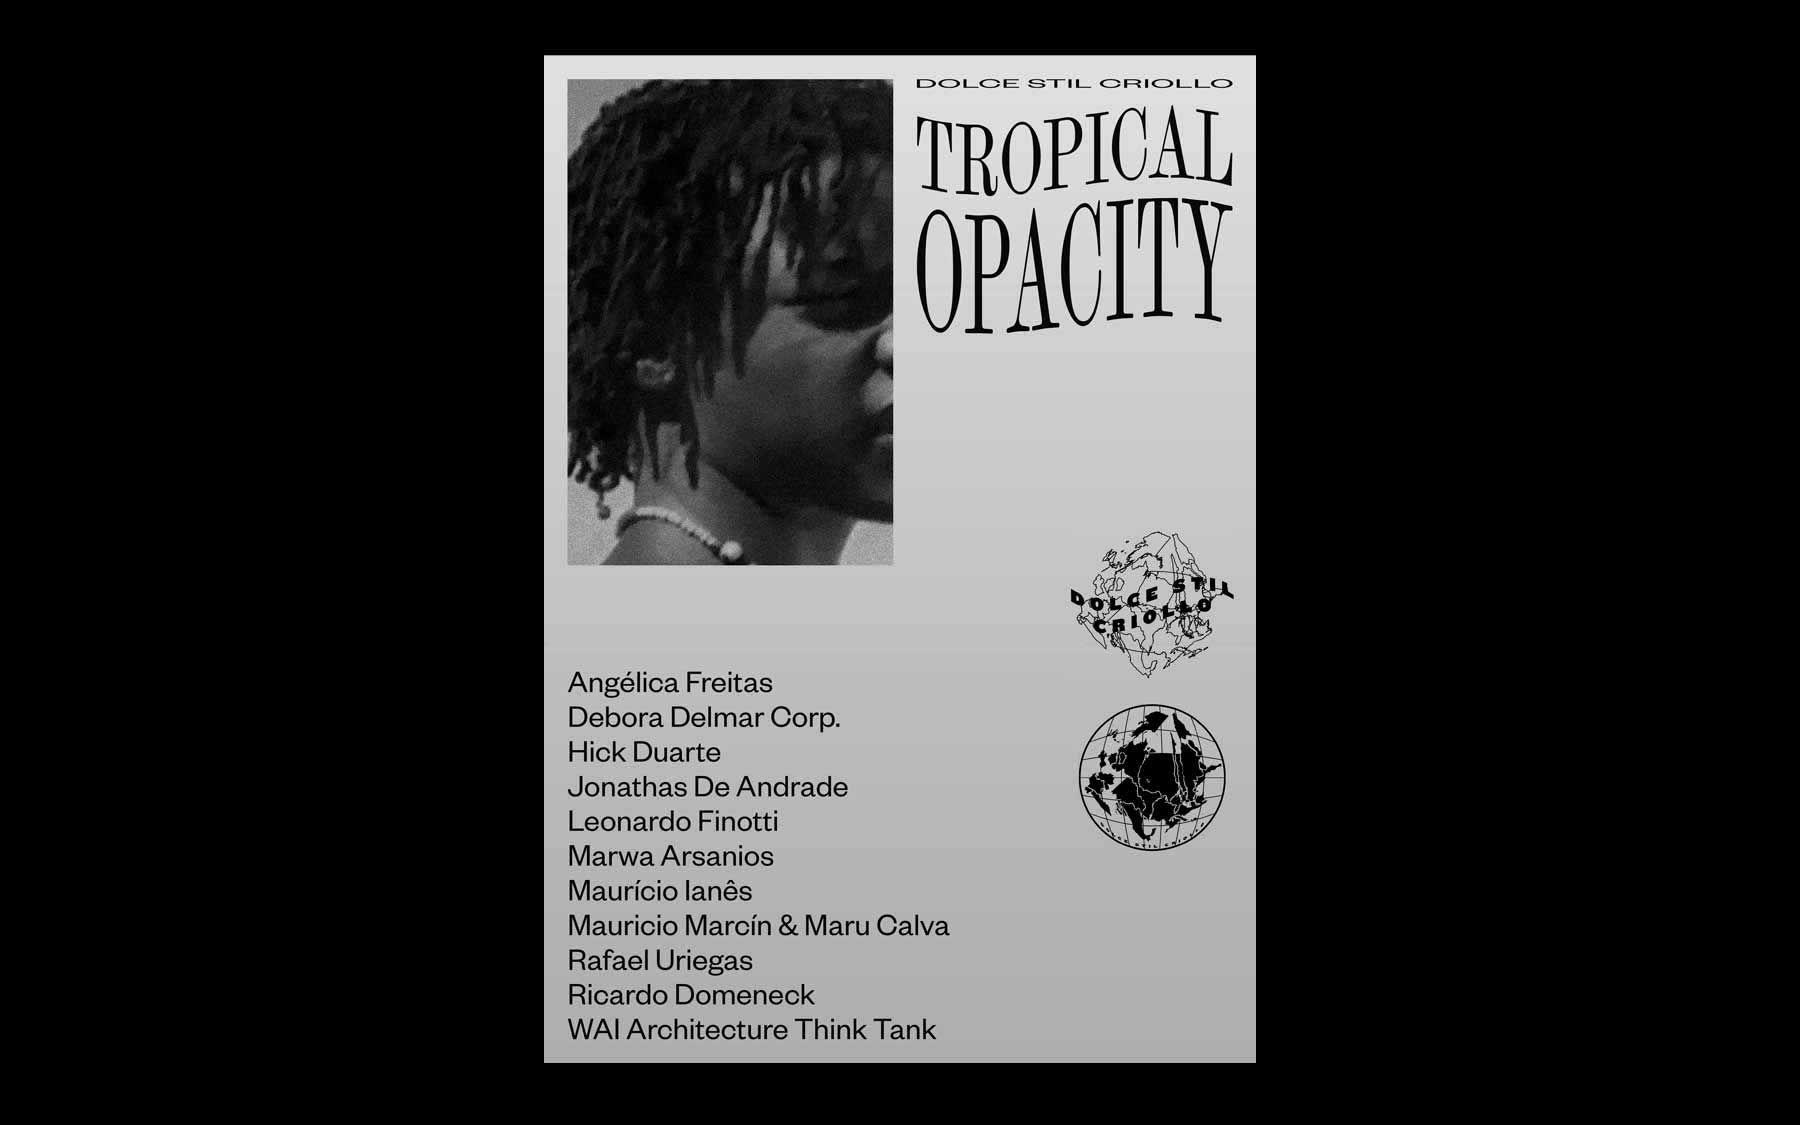 TROPICAL OPACITY edition image